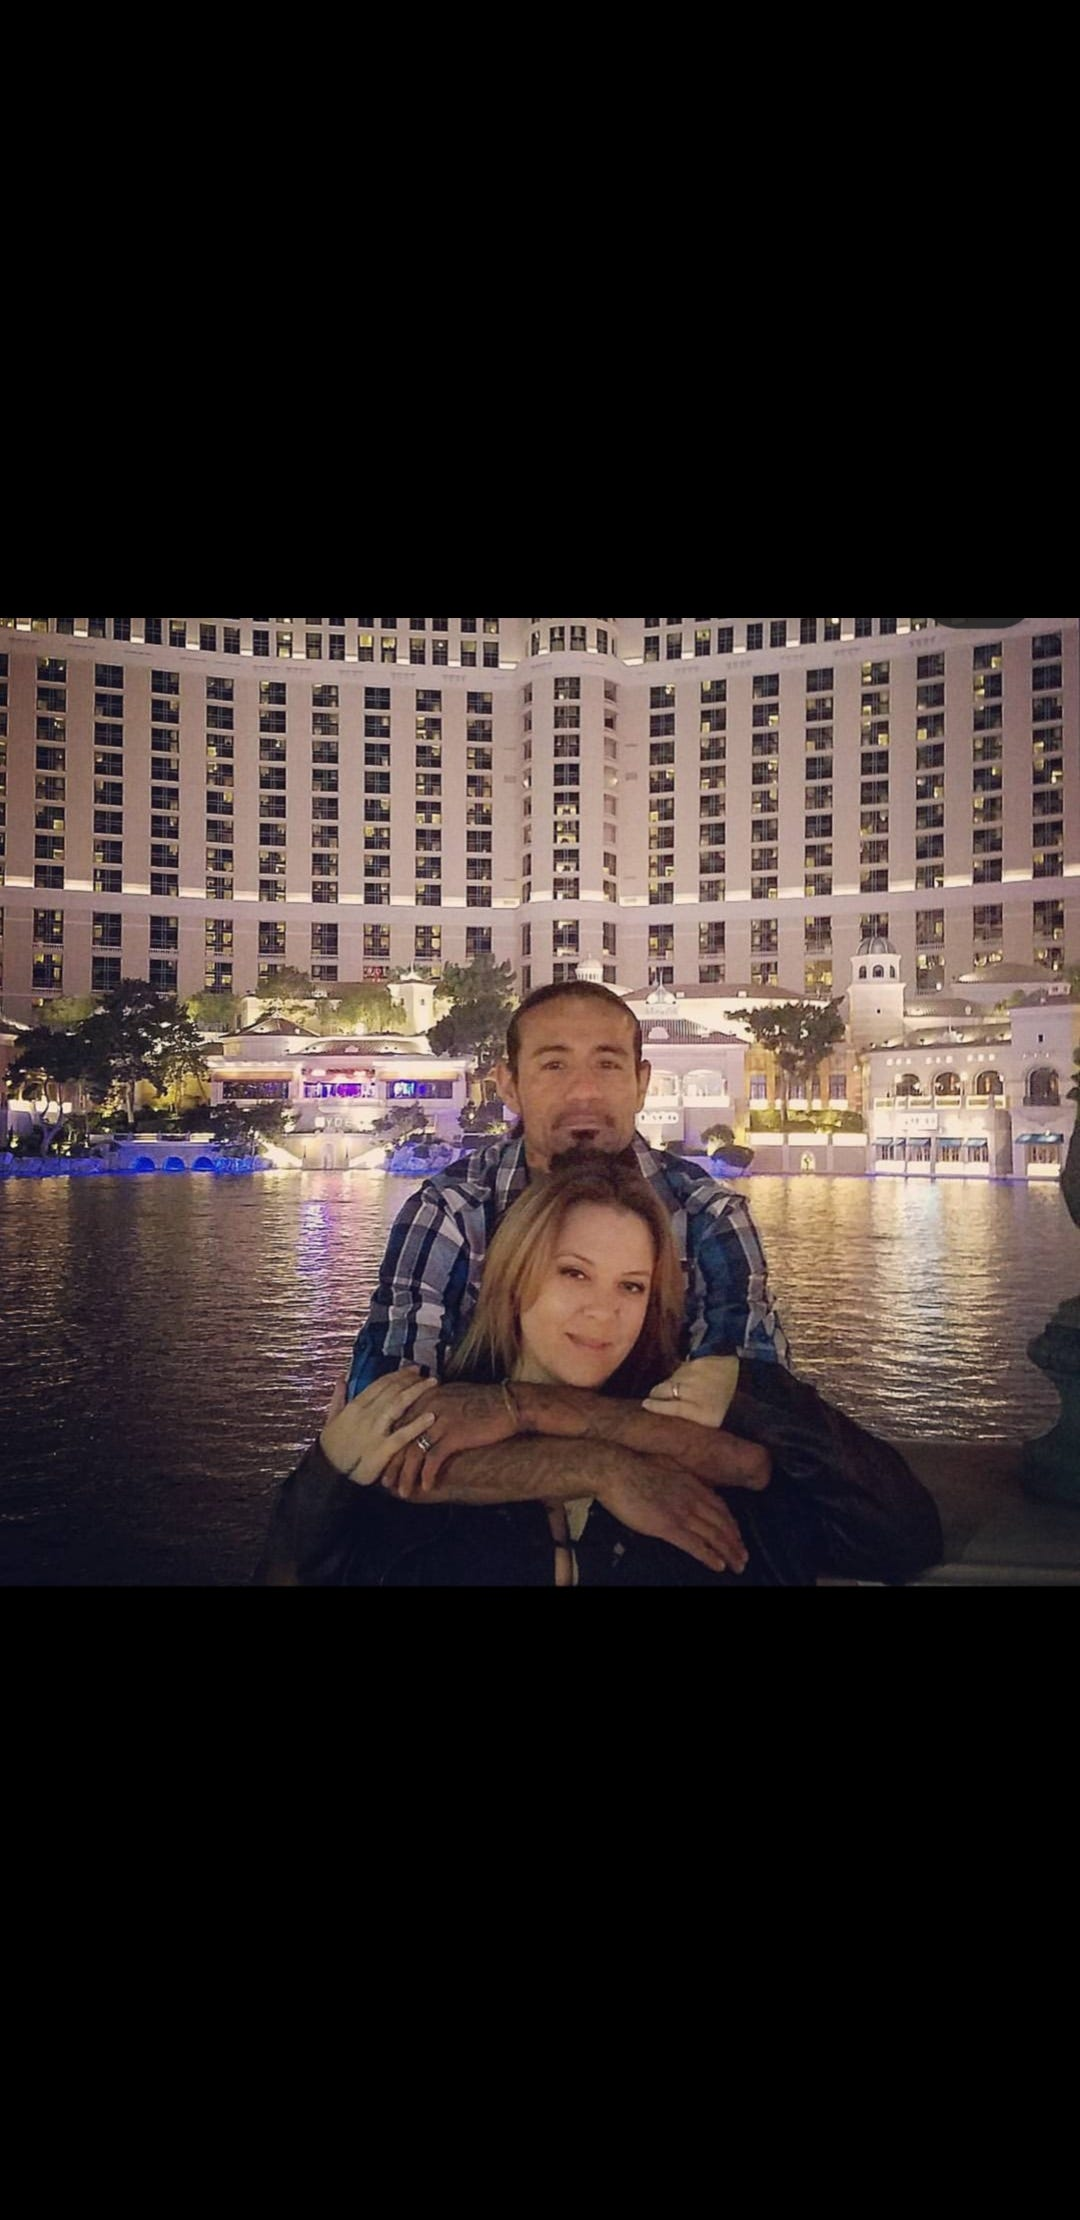 Joe and Sheena Meza the day before their wedding in Las Vegas, 2017.